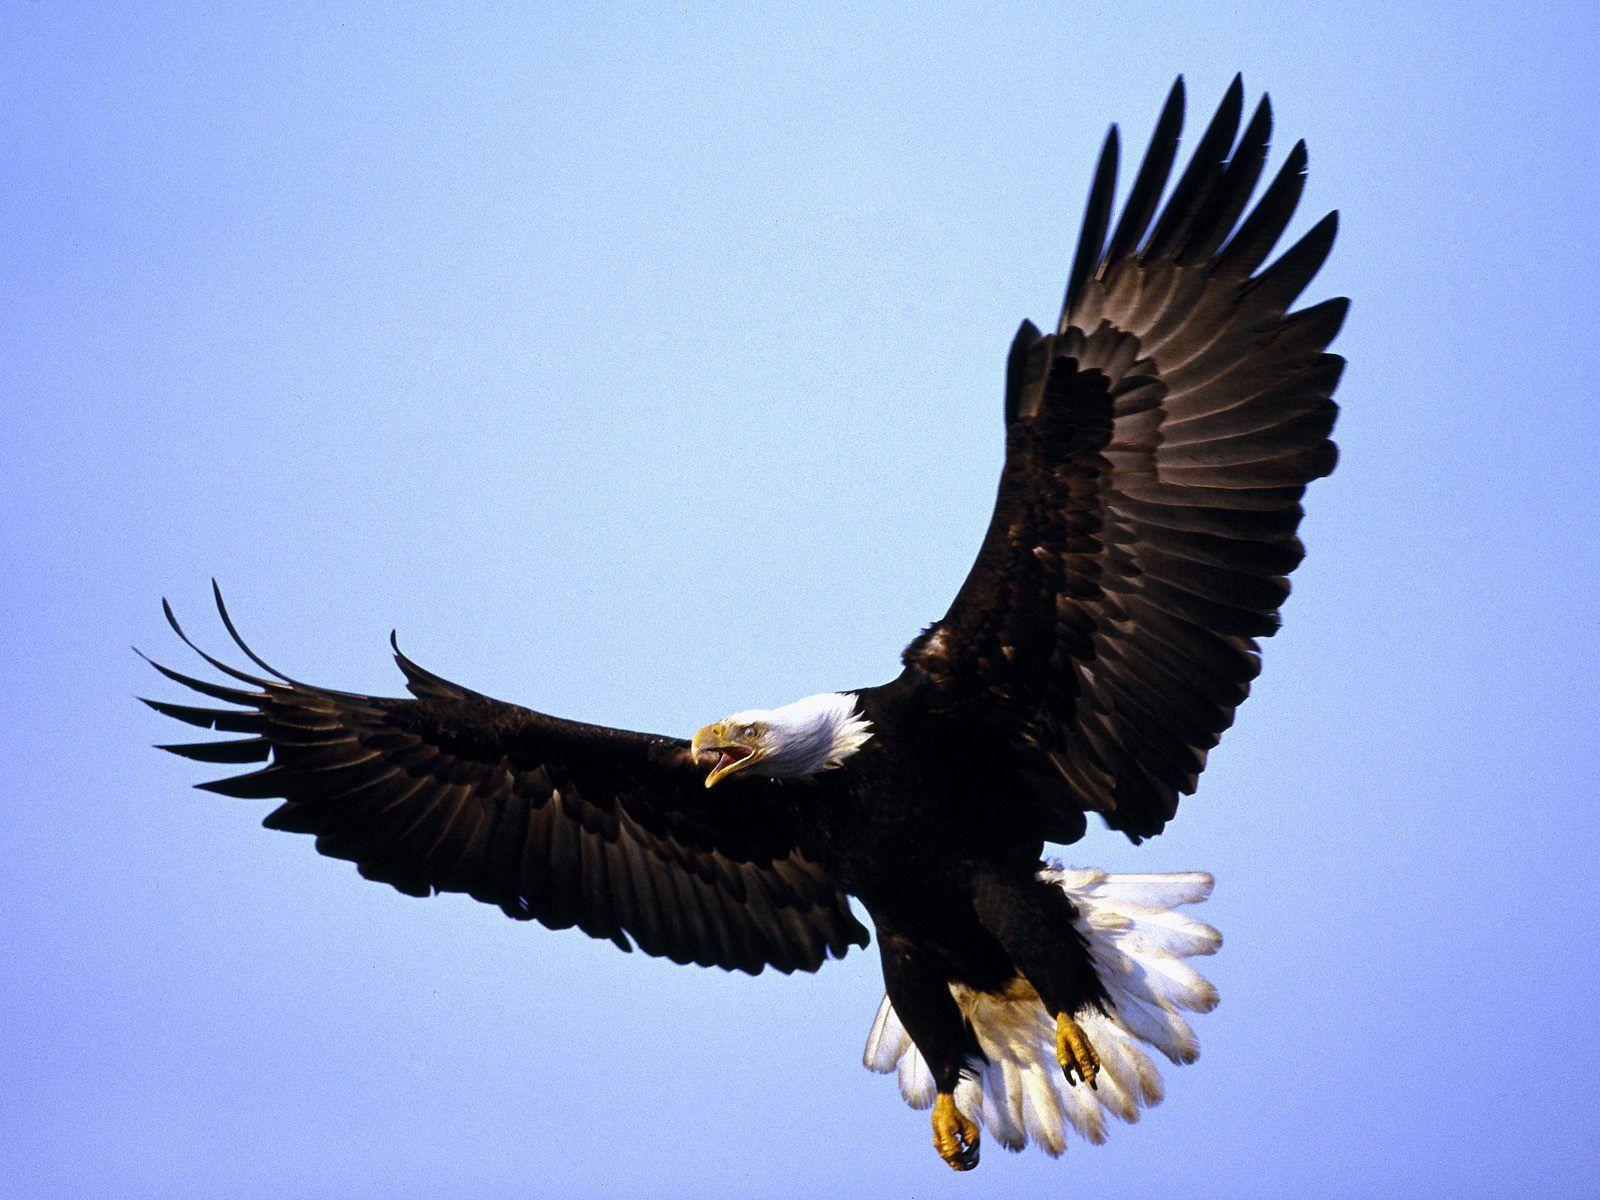 Bald Eagle Pictures Eagle Pictures Eagle Images 1080p eagle images hd wallpaper download